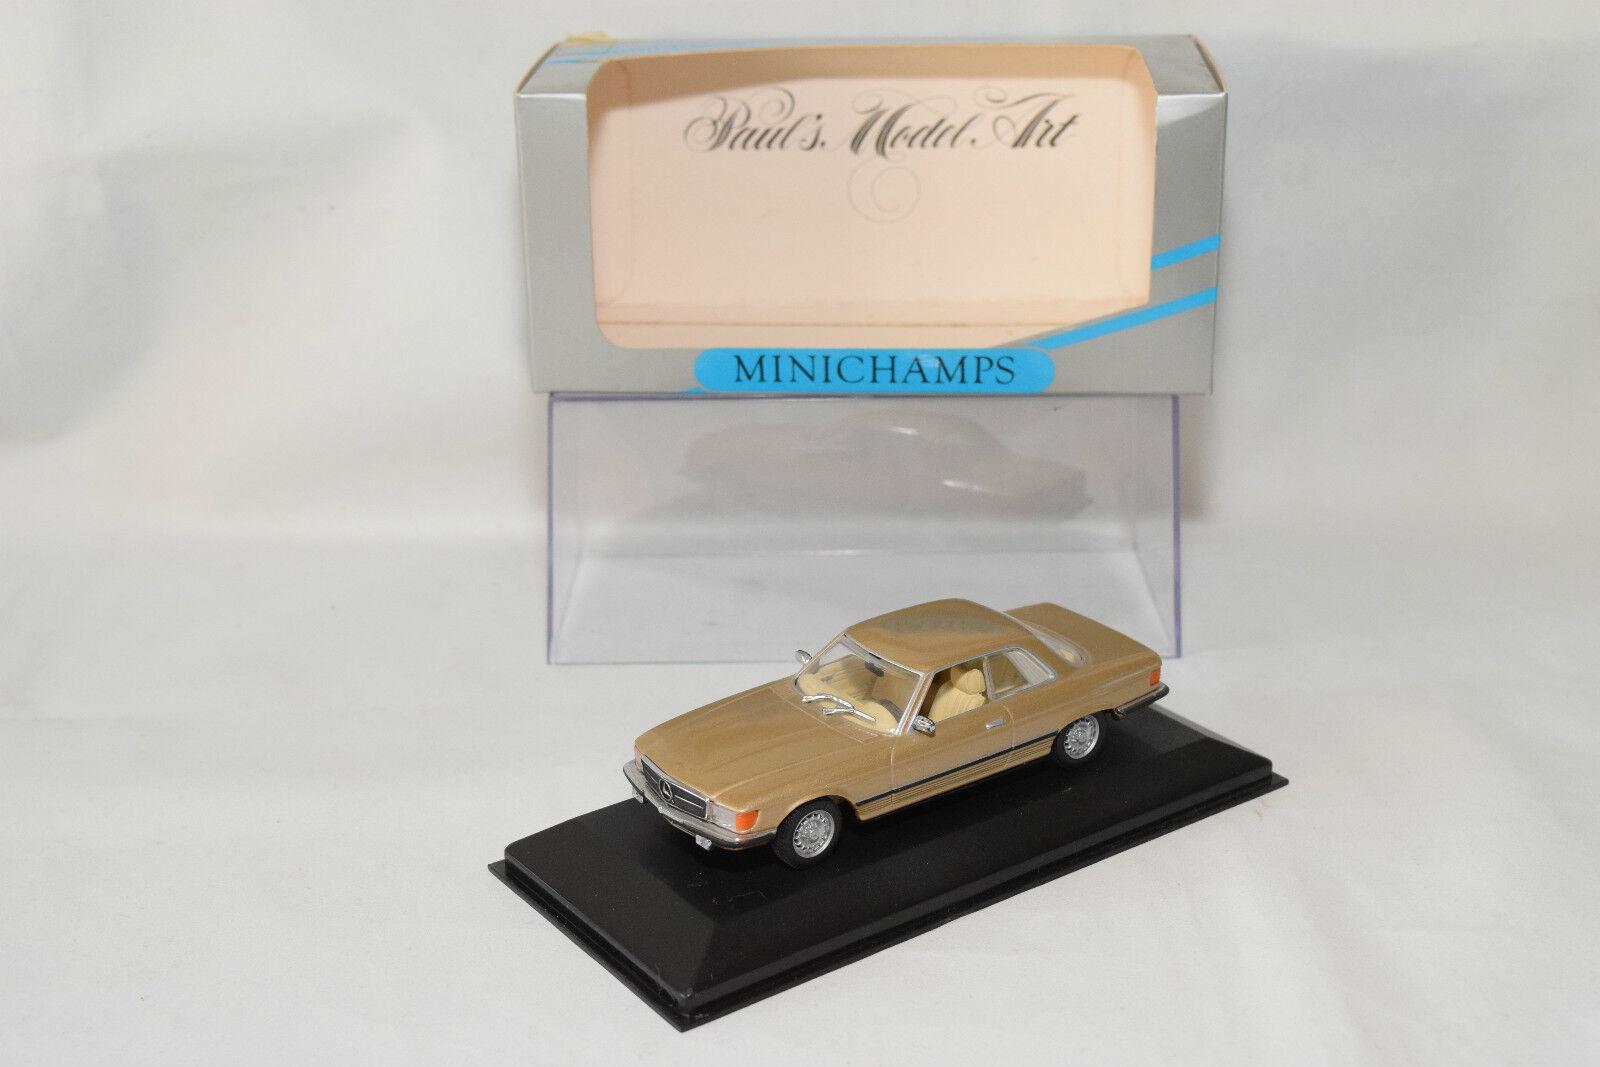 . MINICHAMPS MERCEDES BENZ BENZ BENZ 450 SLC 450SLC 1972 1980 MET. oro MINT BOXED 951463